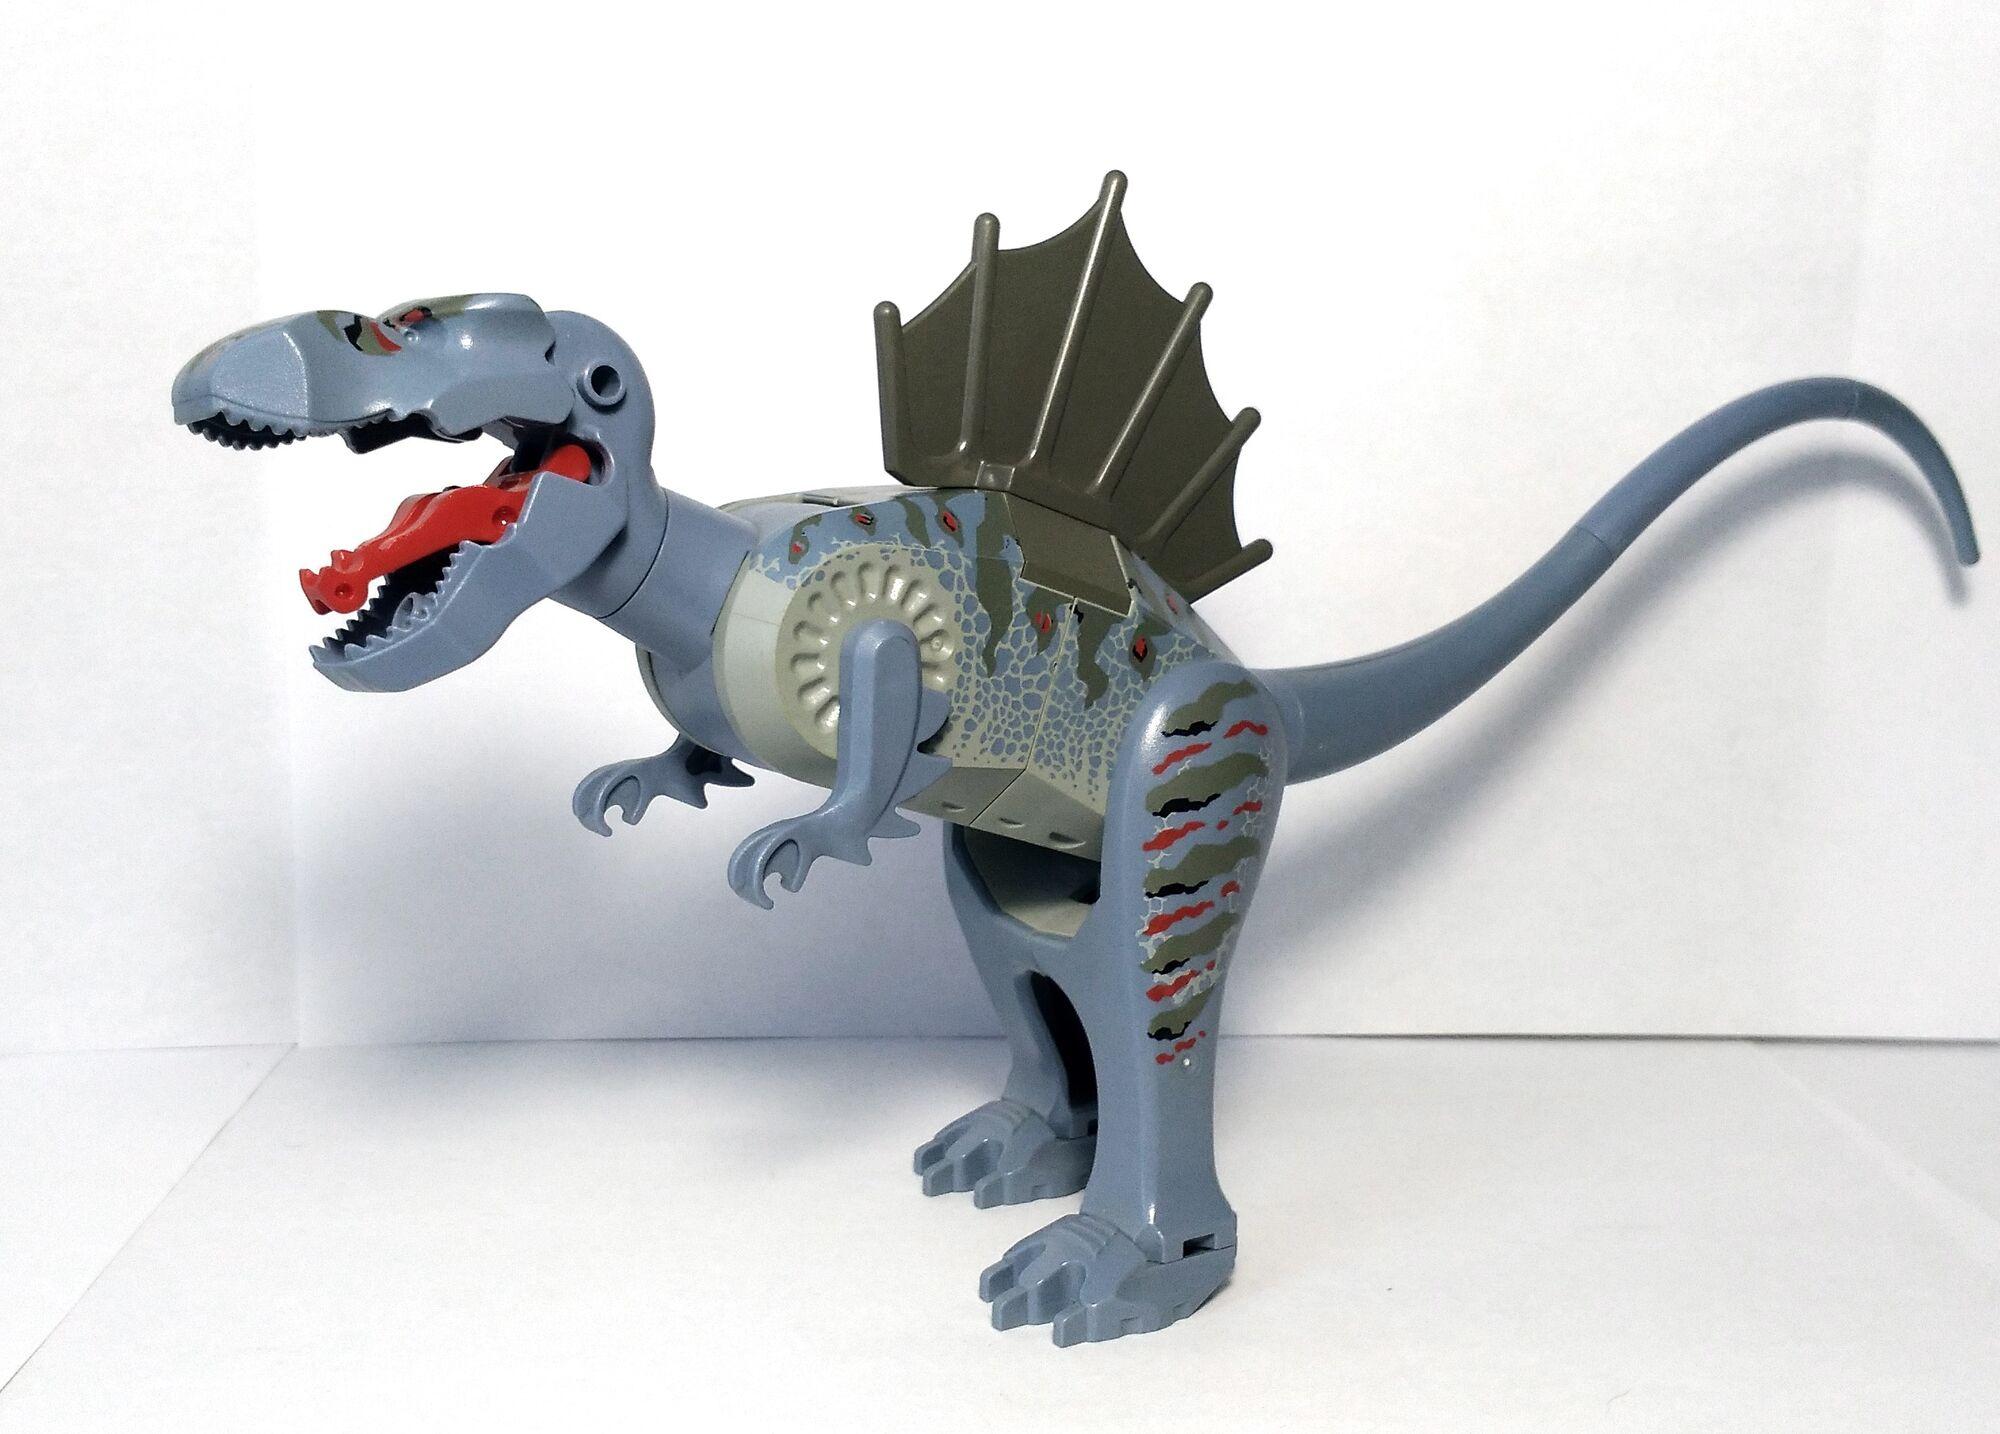 Spinosaurus brickipedia fandom powered by wikia - Lego dinosaurs spinosaurus ...